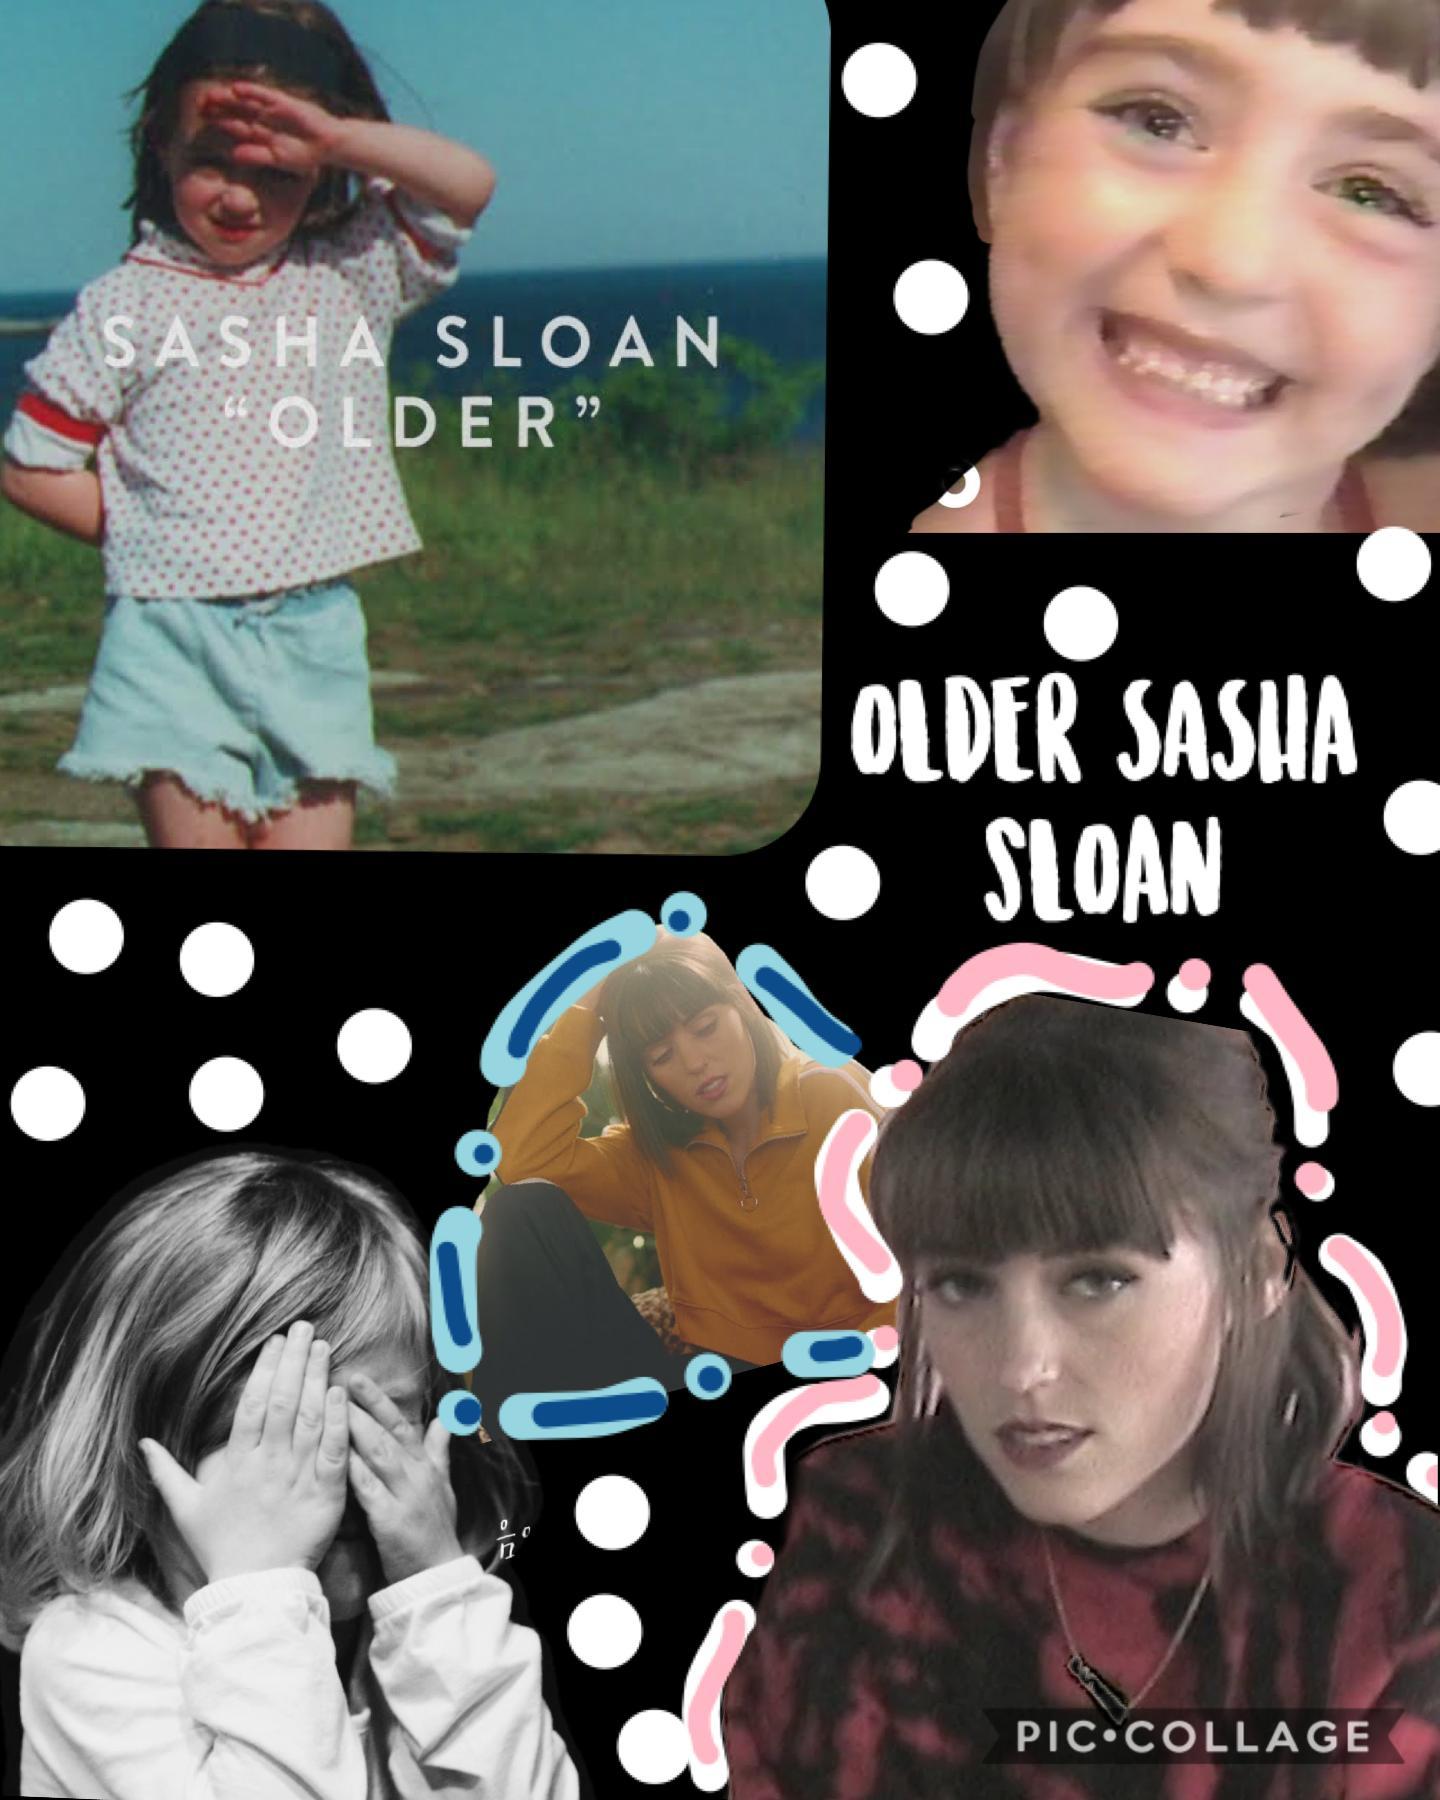 I luv older by Sasha Sloan